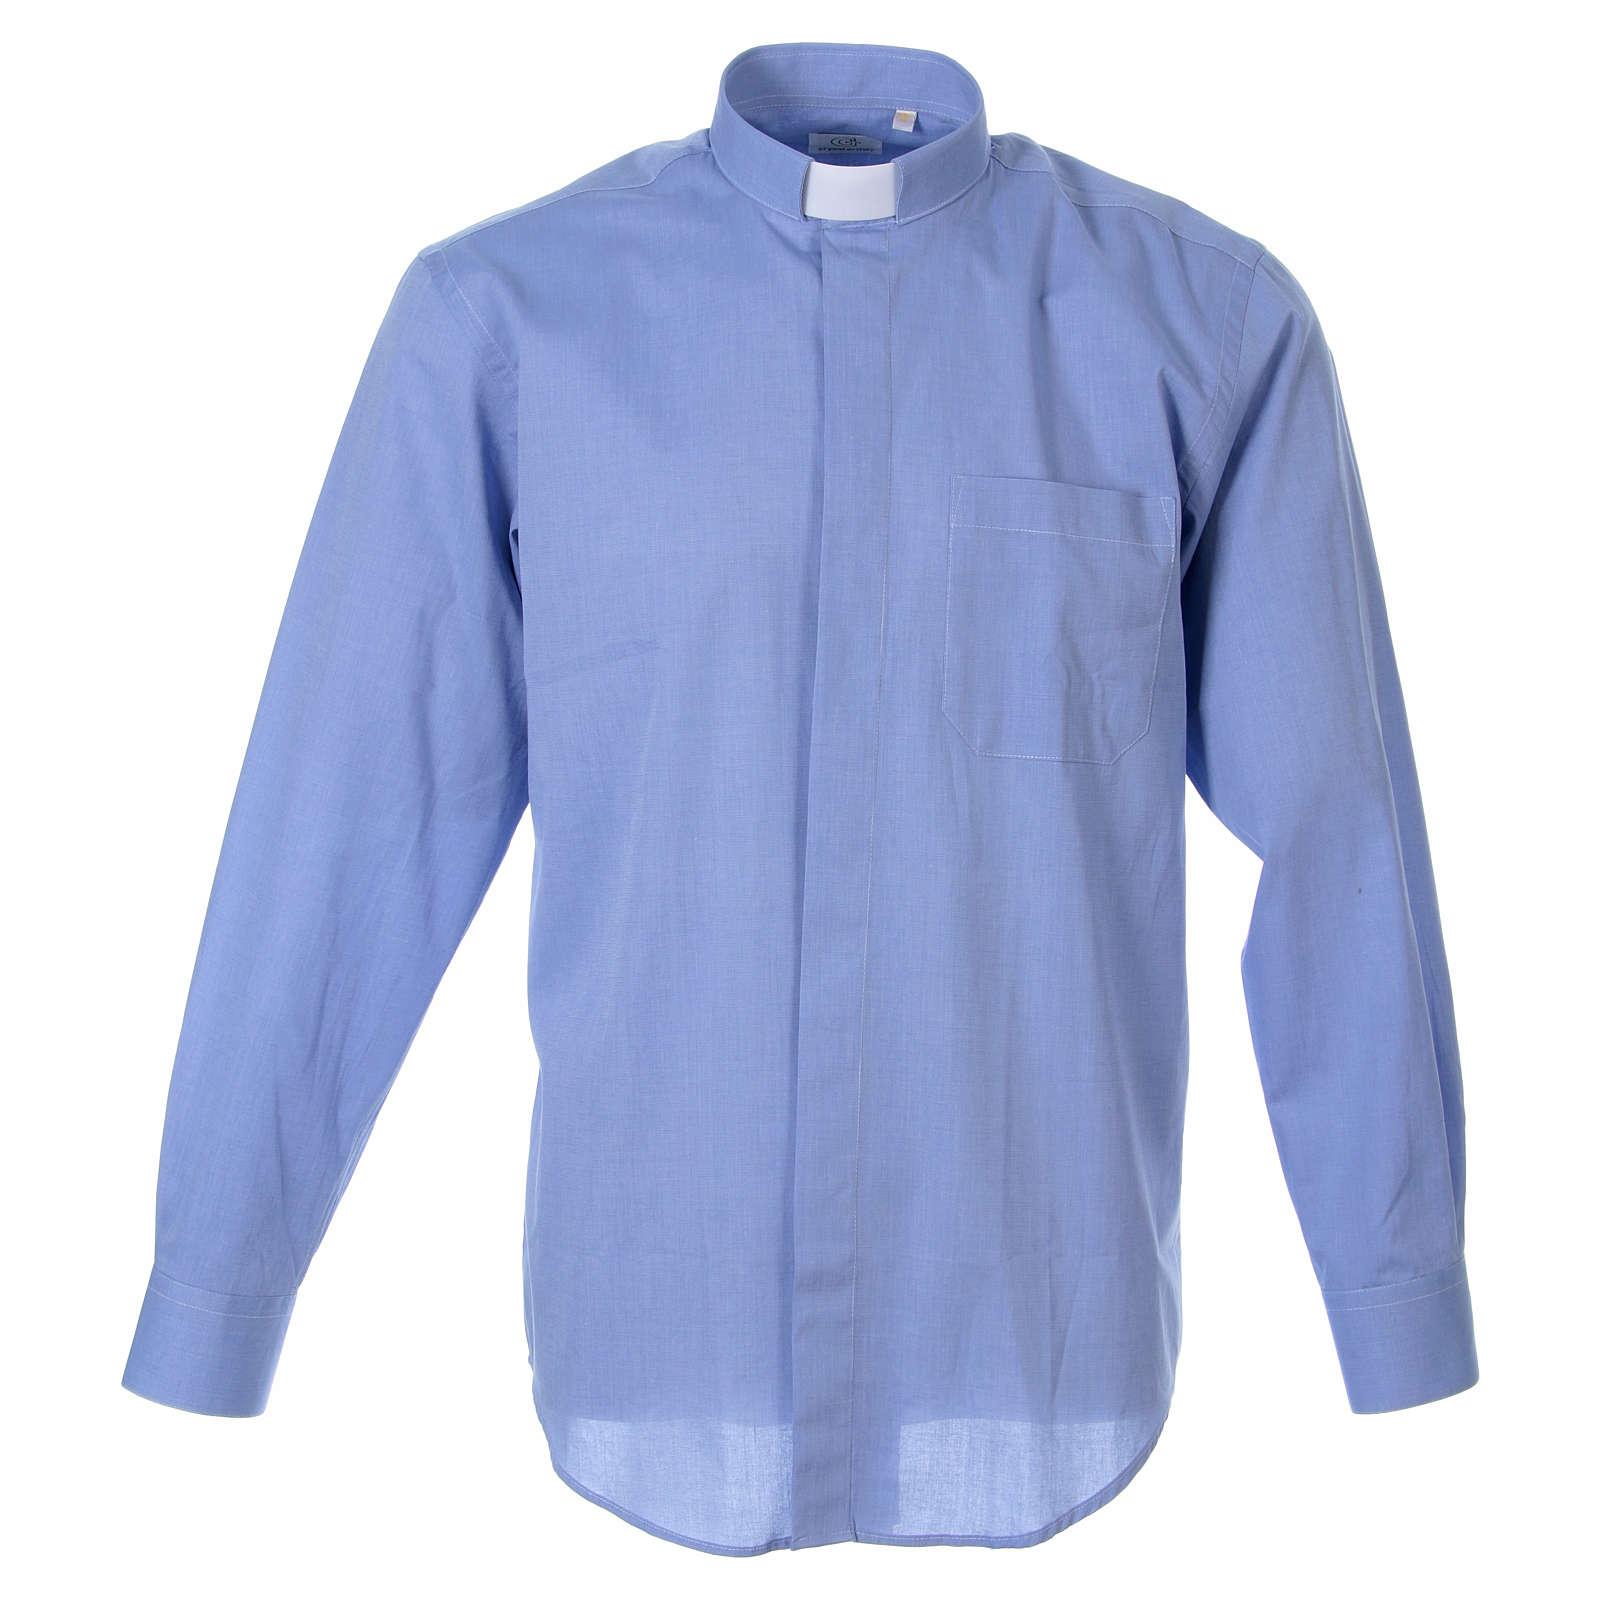 STOCK Clergyman shirt in fil-a-fil light blue cotton, long sleeves 4